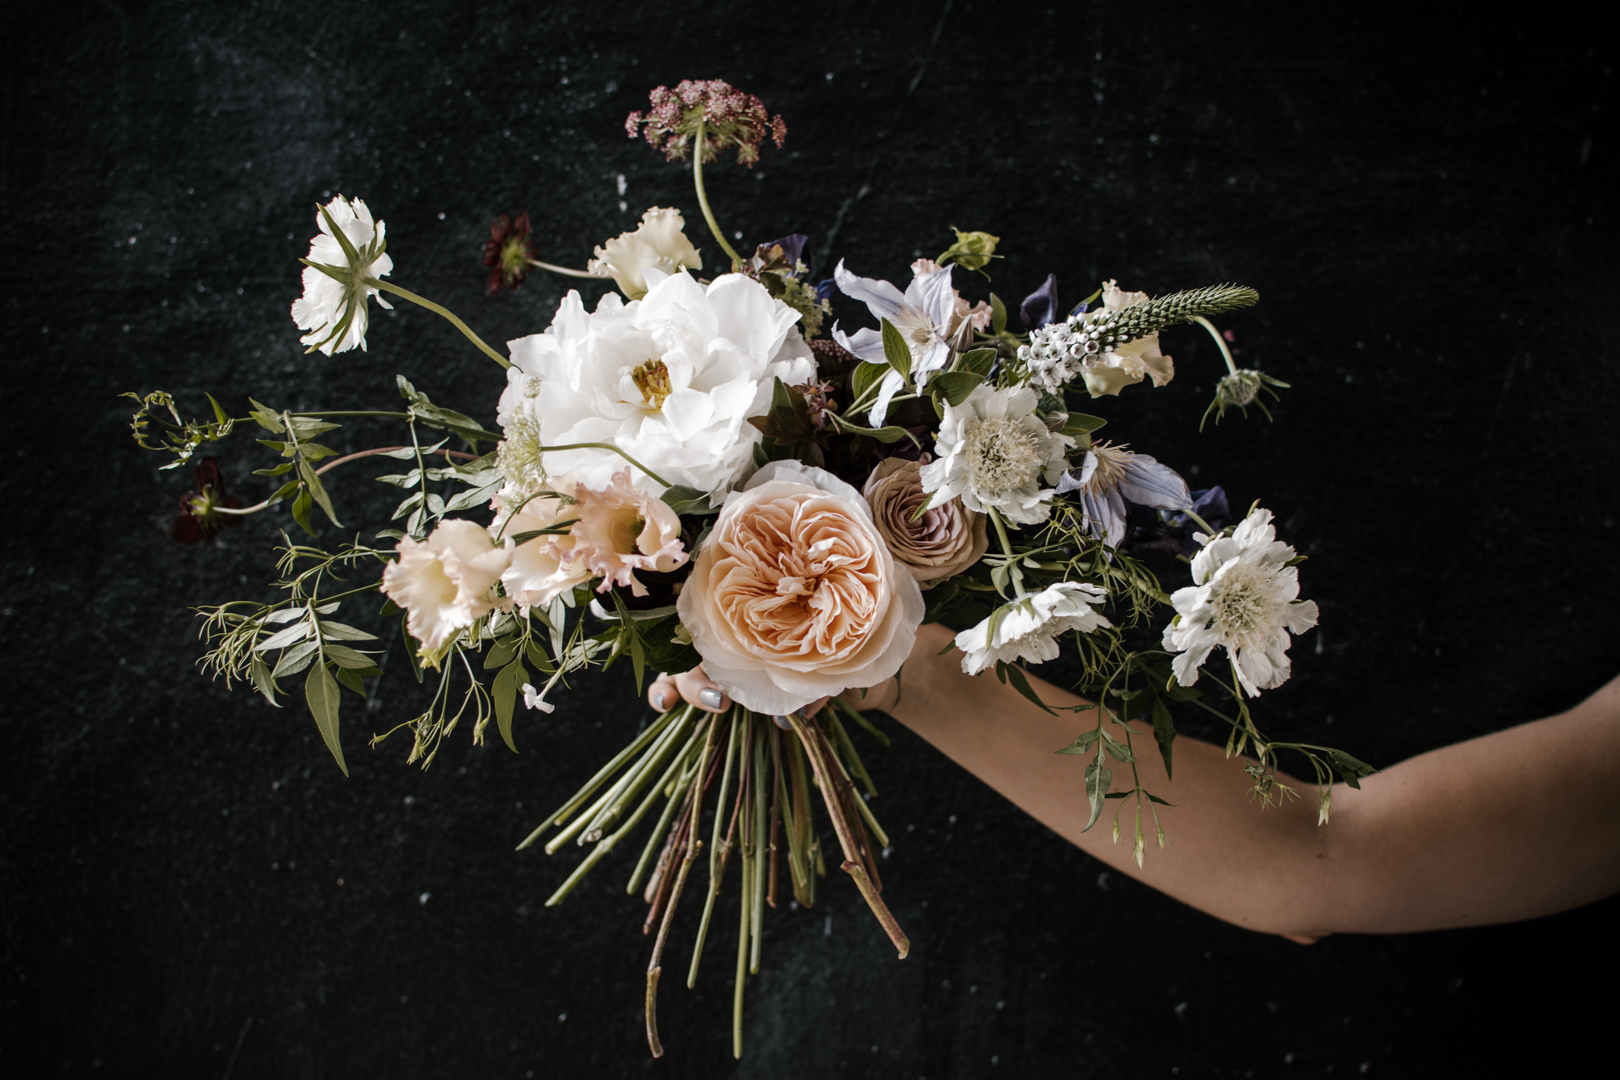 Bristol Venue Photoshoot, Wedding Flowers at the Forge-2.jpg